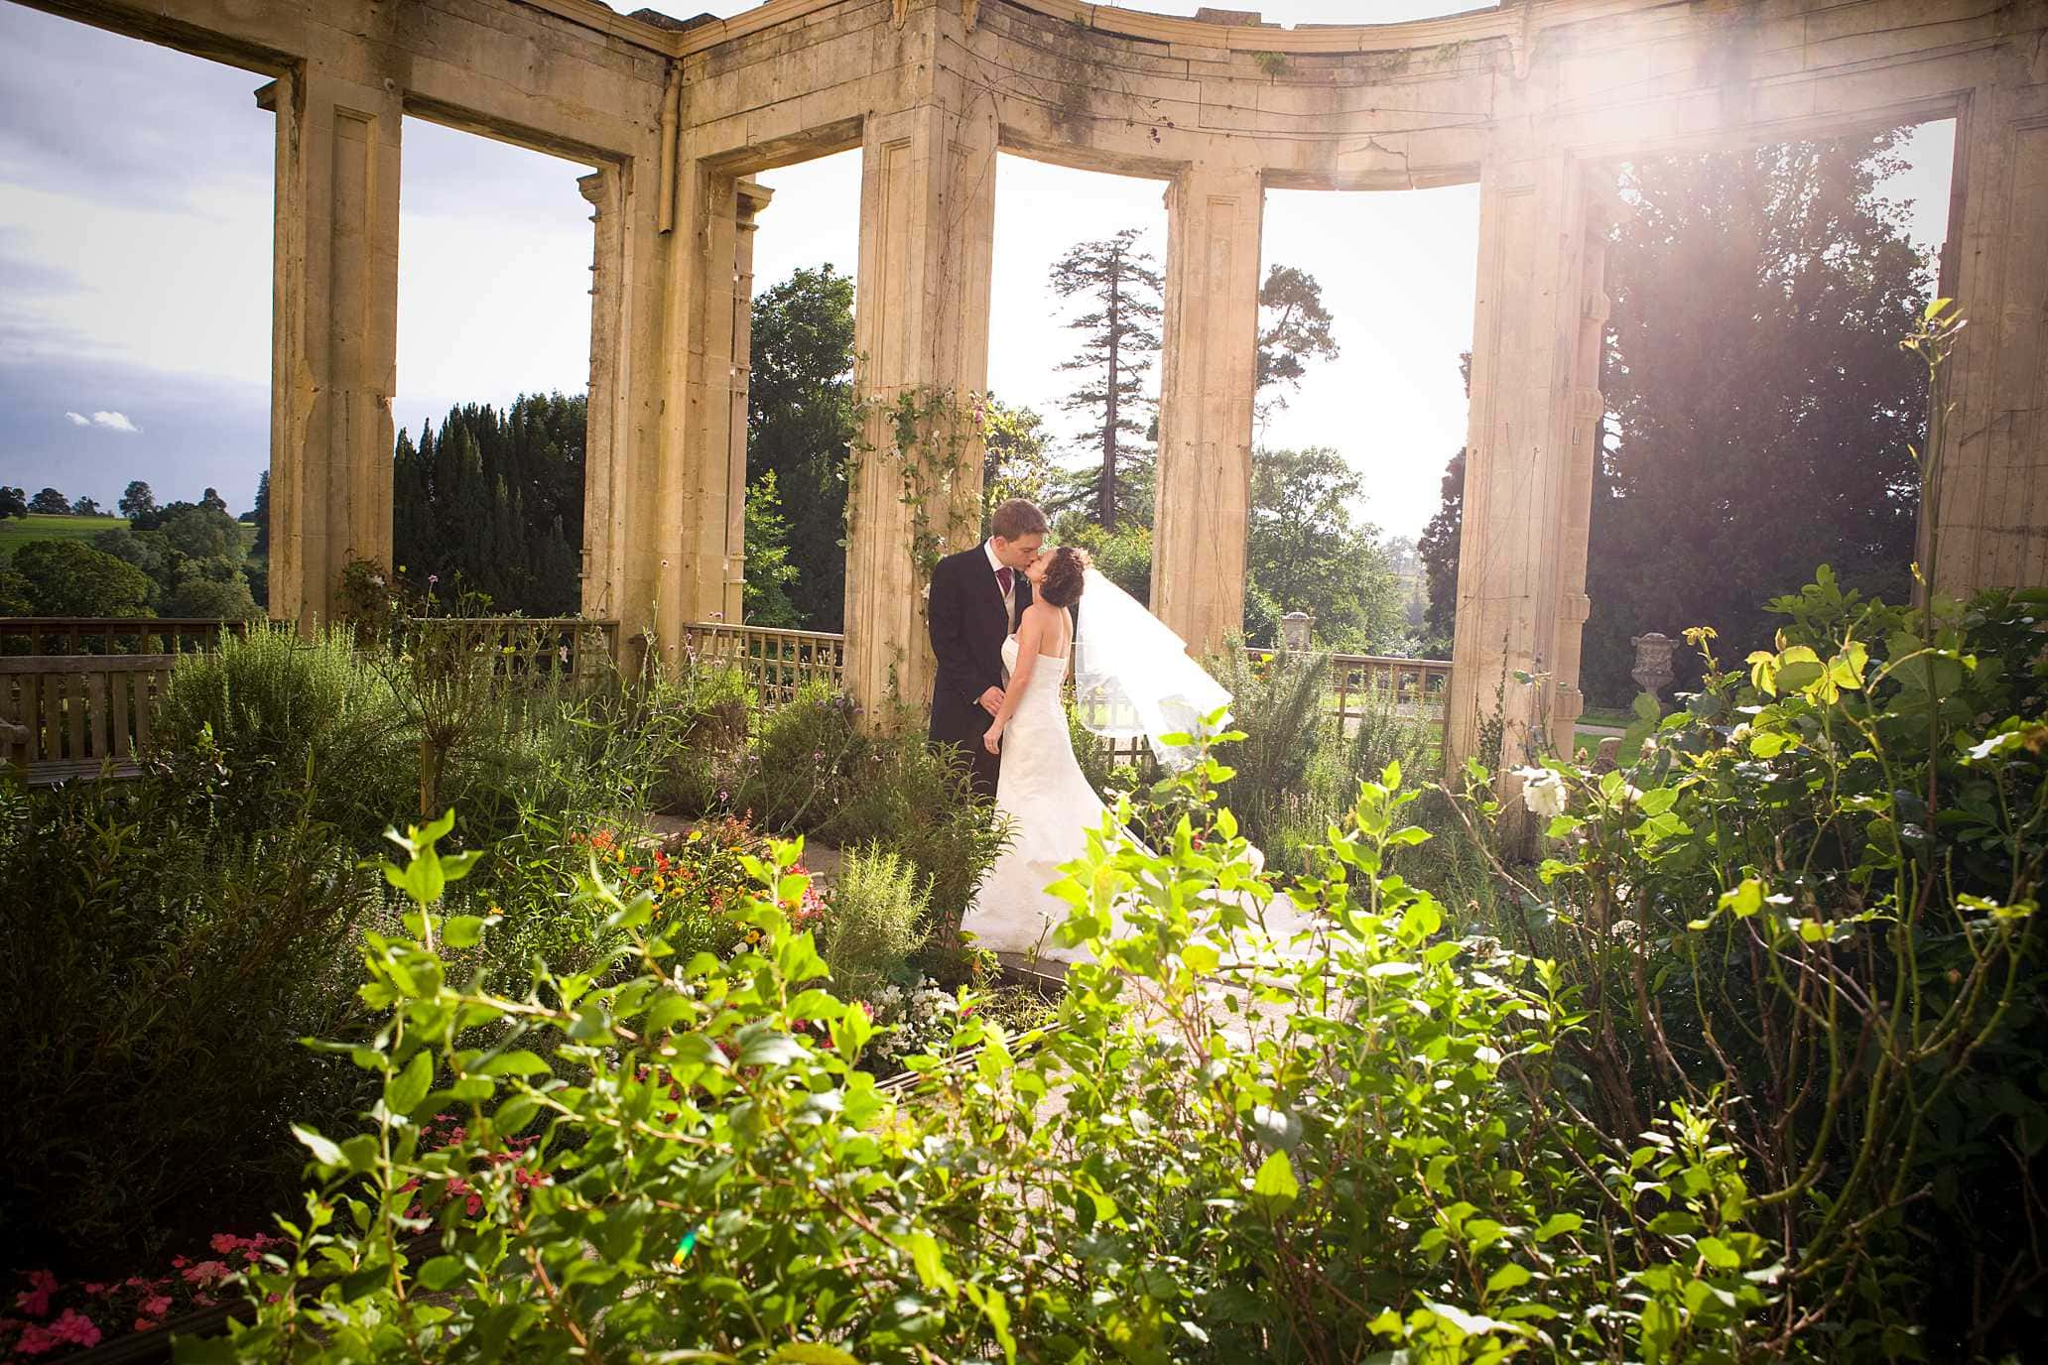 Orchardliegh House wedding photographer | Marish & Harry